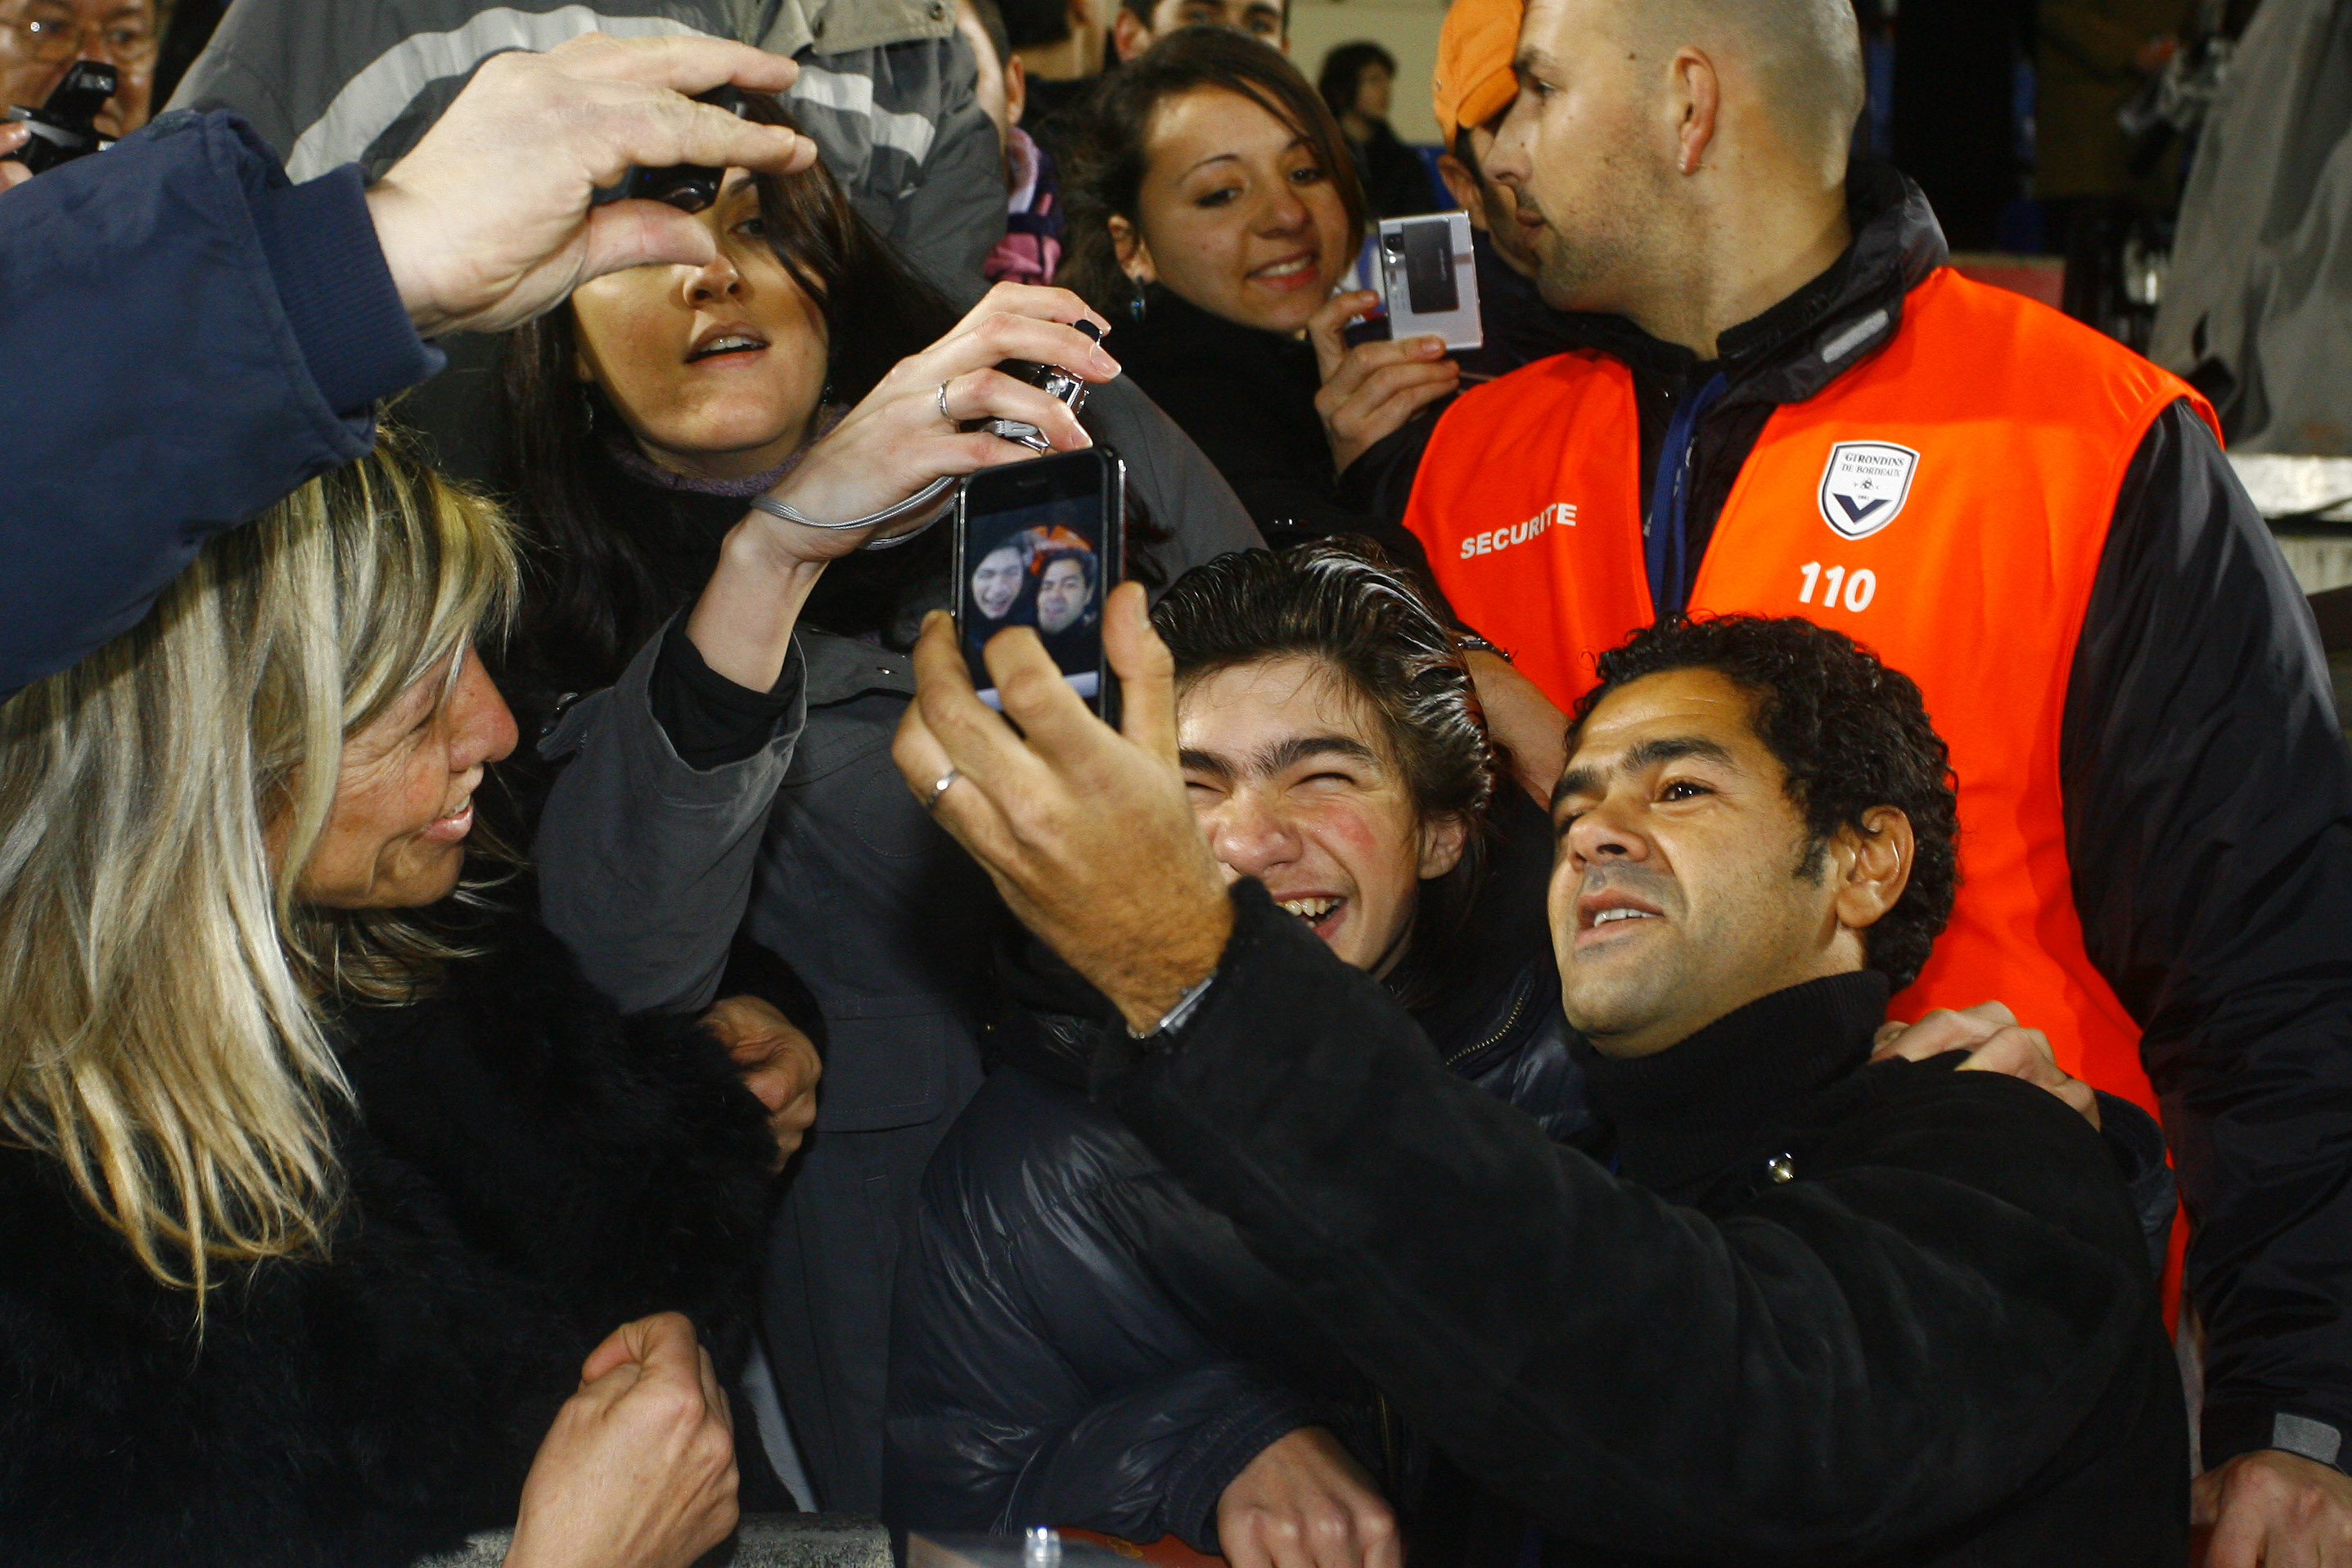 (Photo credit should read NICOLAS TUCAT/AFP/Getty Images)